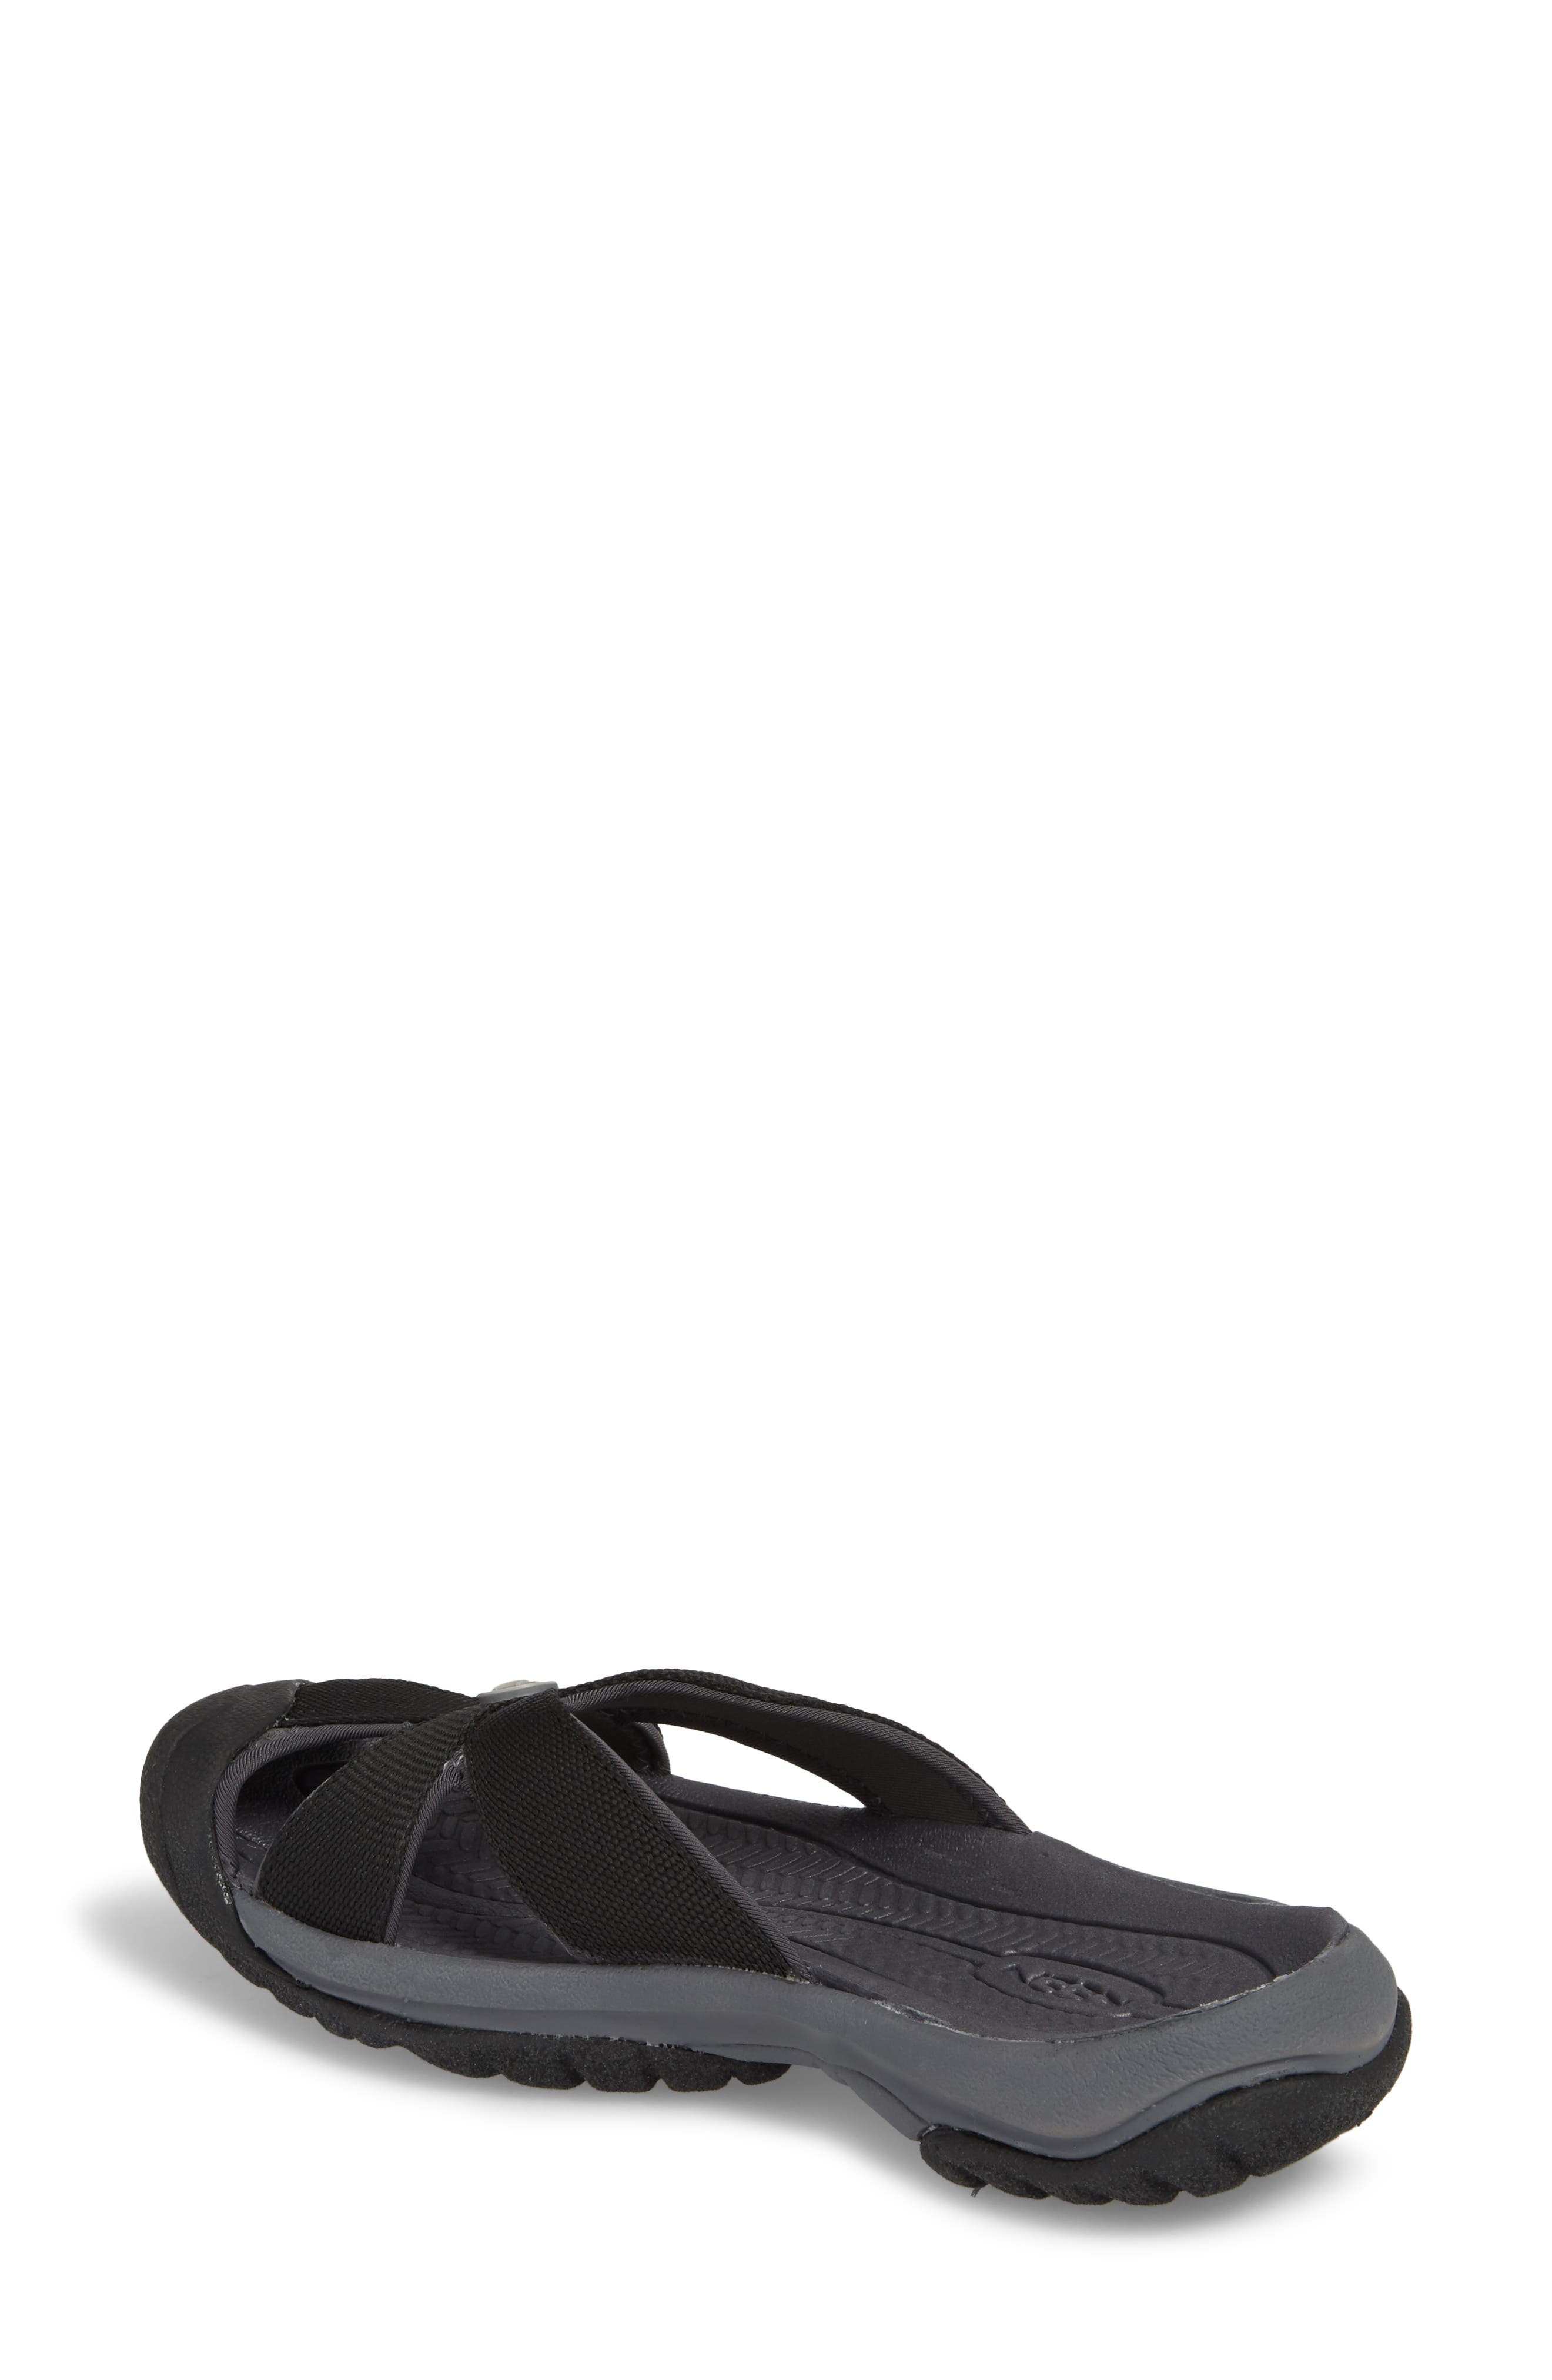 KEEN, 'Bali' Sandal, Alternate thumbnail 2, color, BLACK/ MAGNET